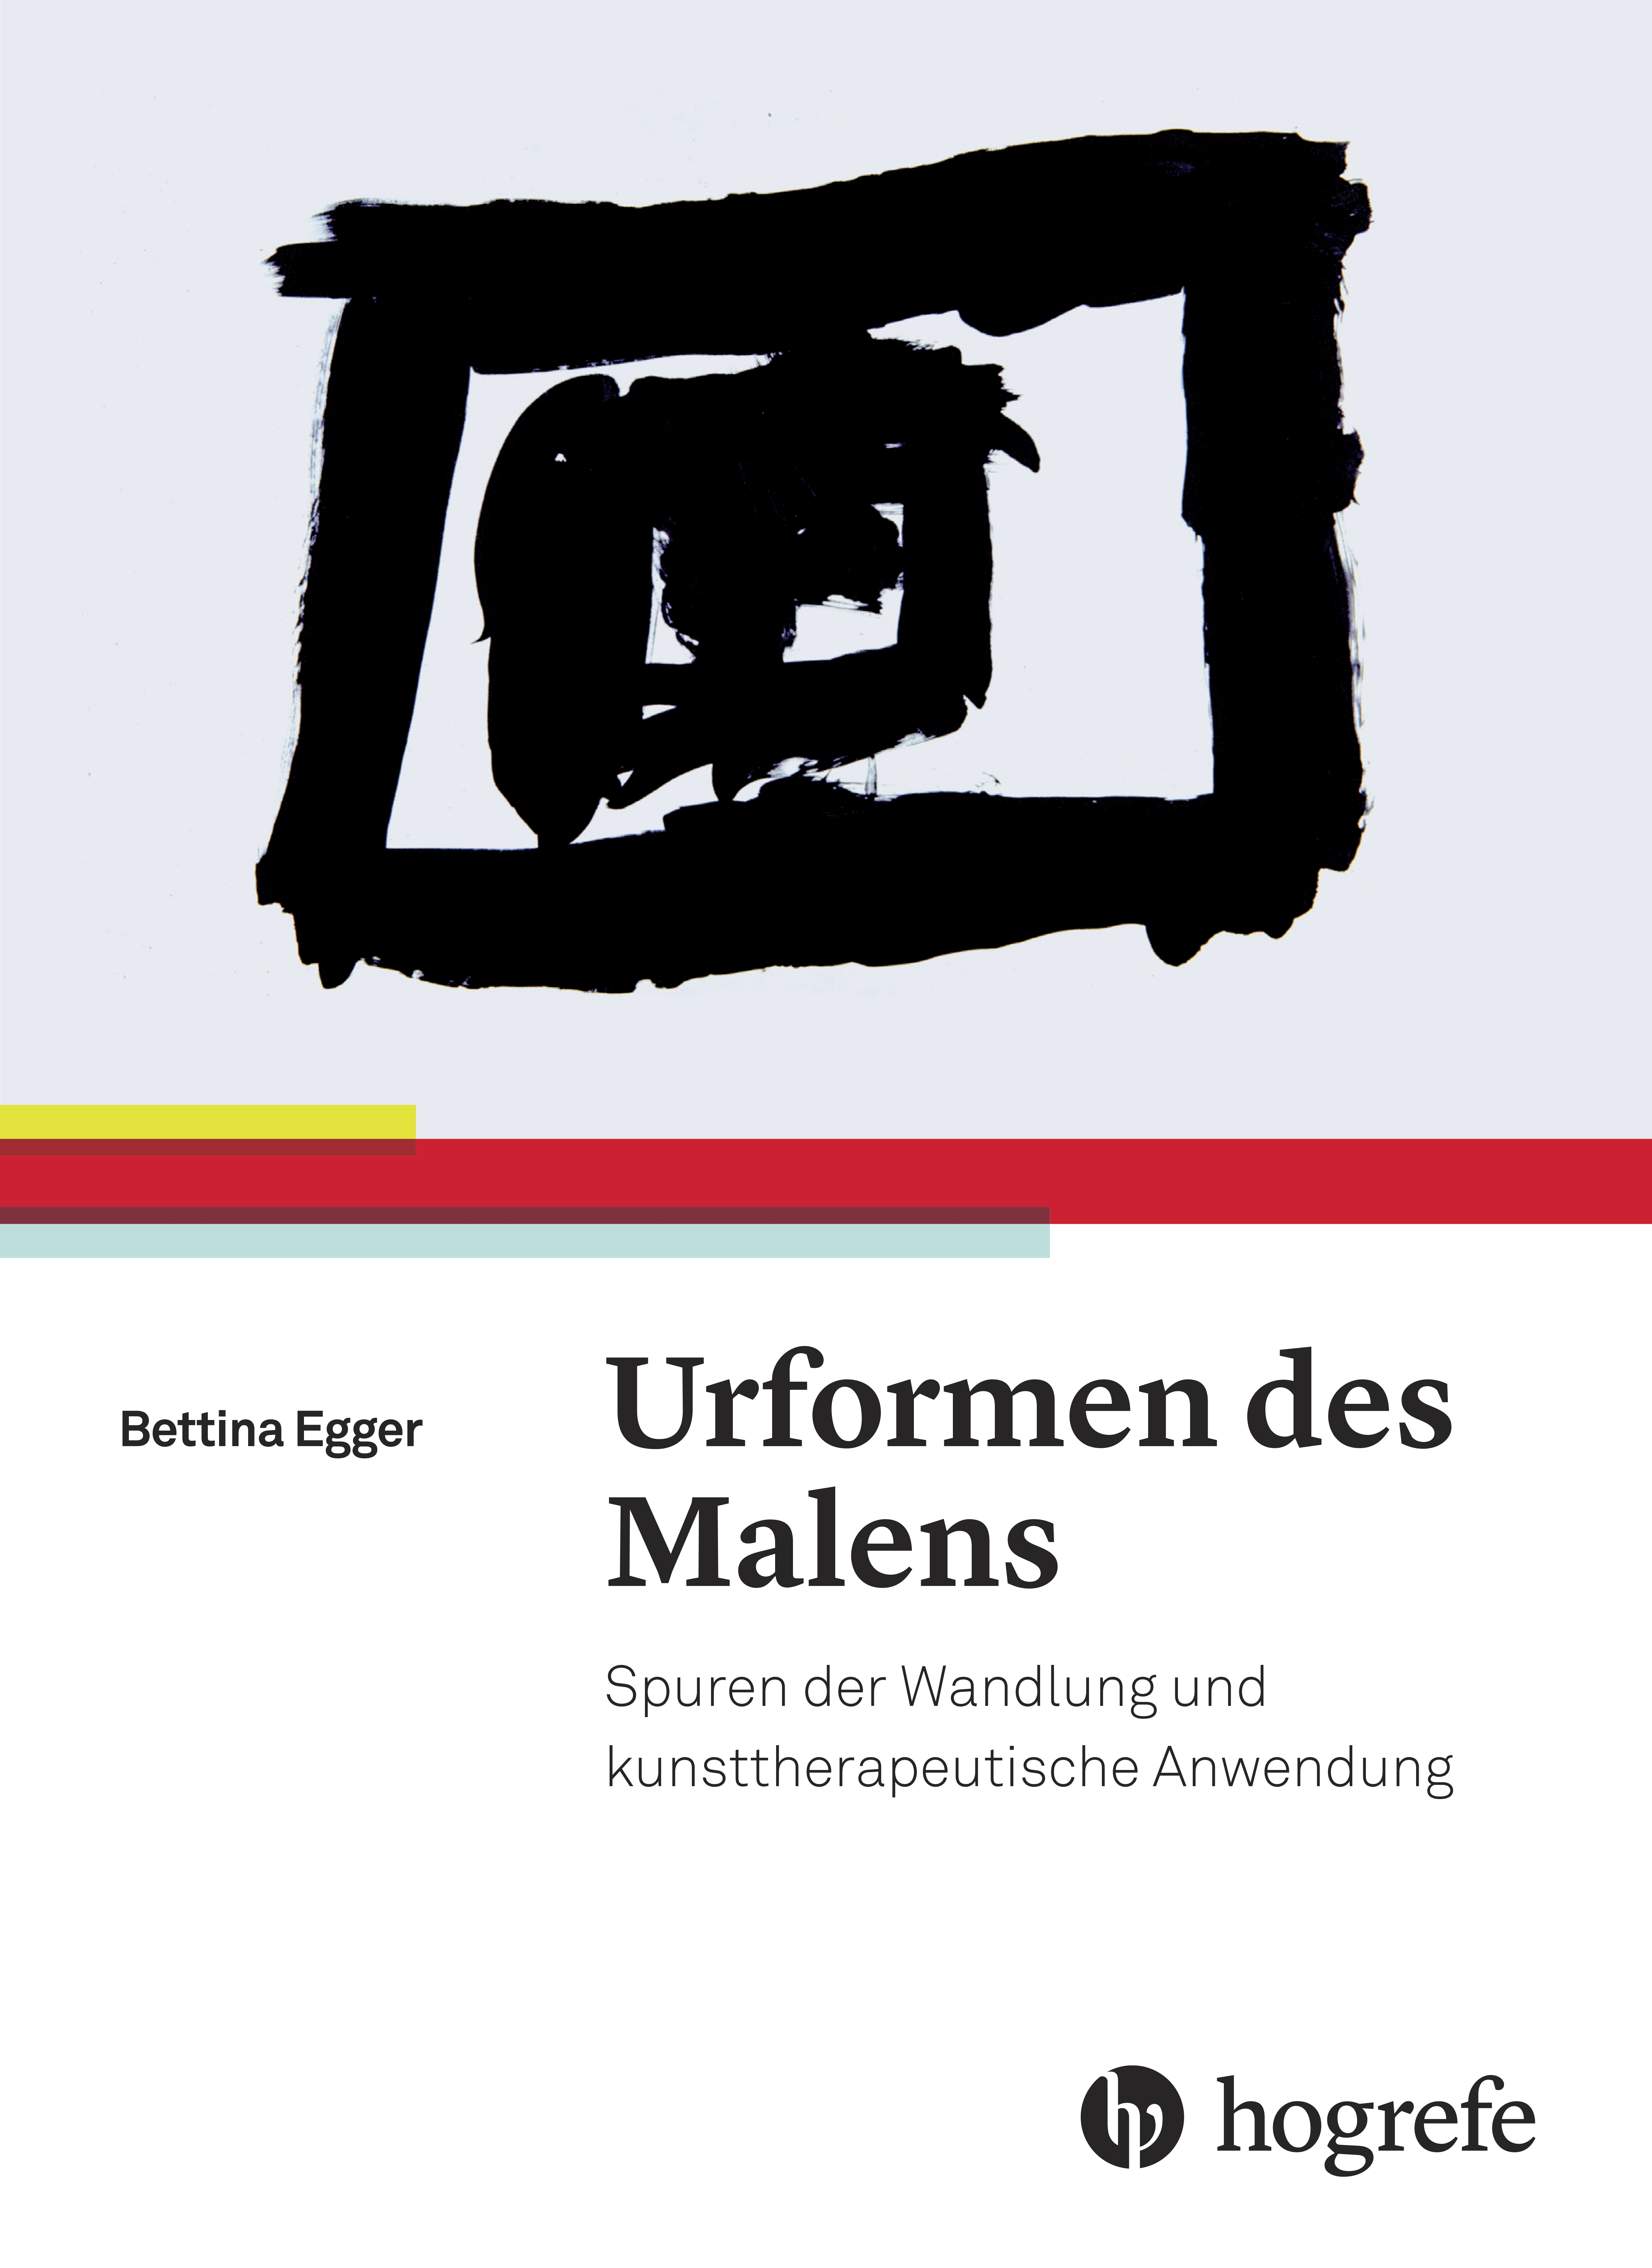 Urformen-des-Malens-Bettina-Egger-9783456855370